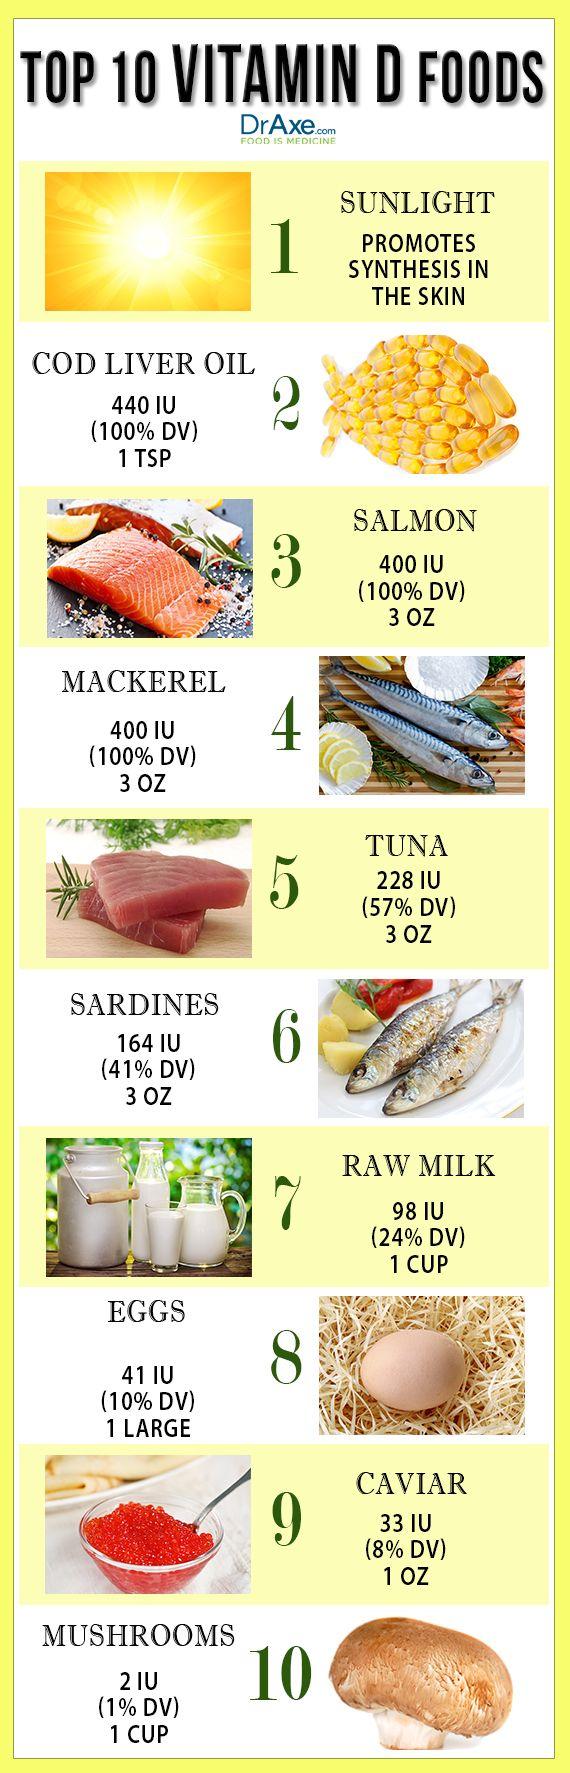 Top Vitamin D Foods + Their 5 Major Benefits Vitamin d